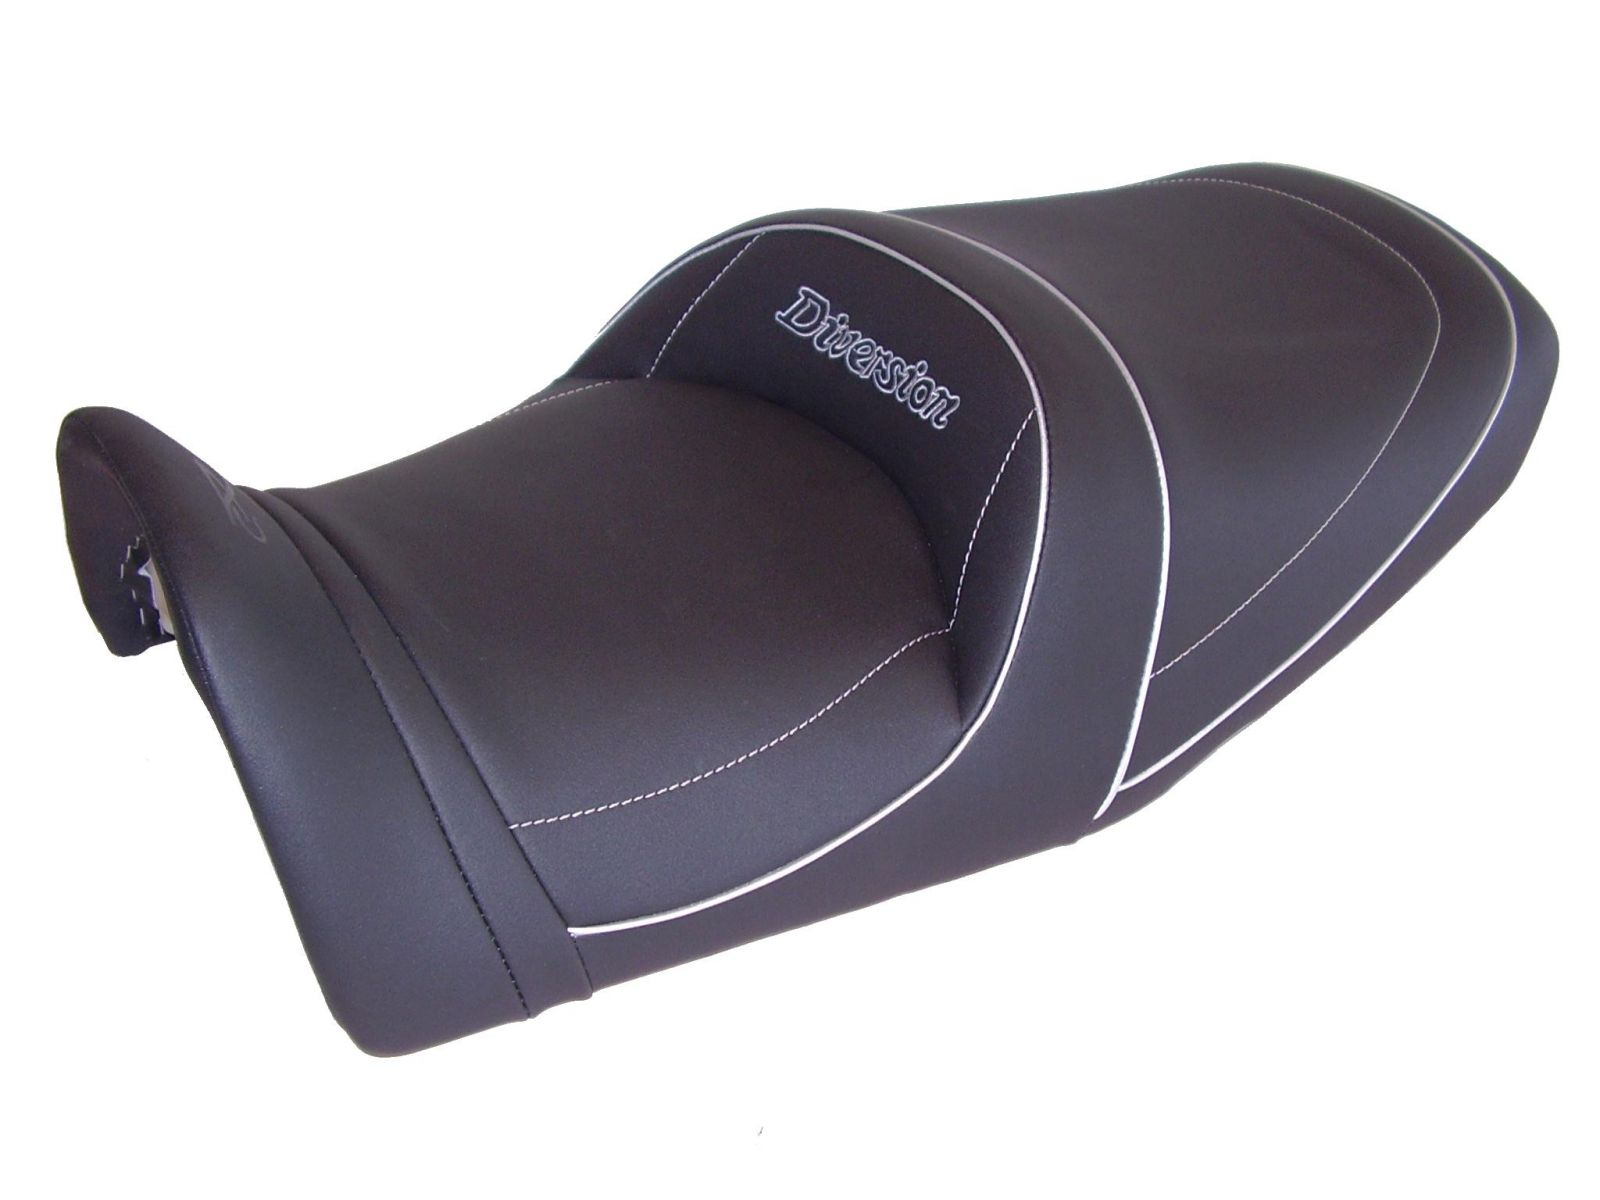 Deluxe seat SGC0980 - YAMAHA DIVERSION XJ 900 [1995-2003]